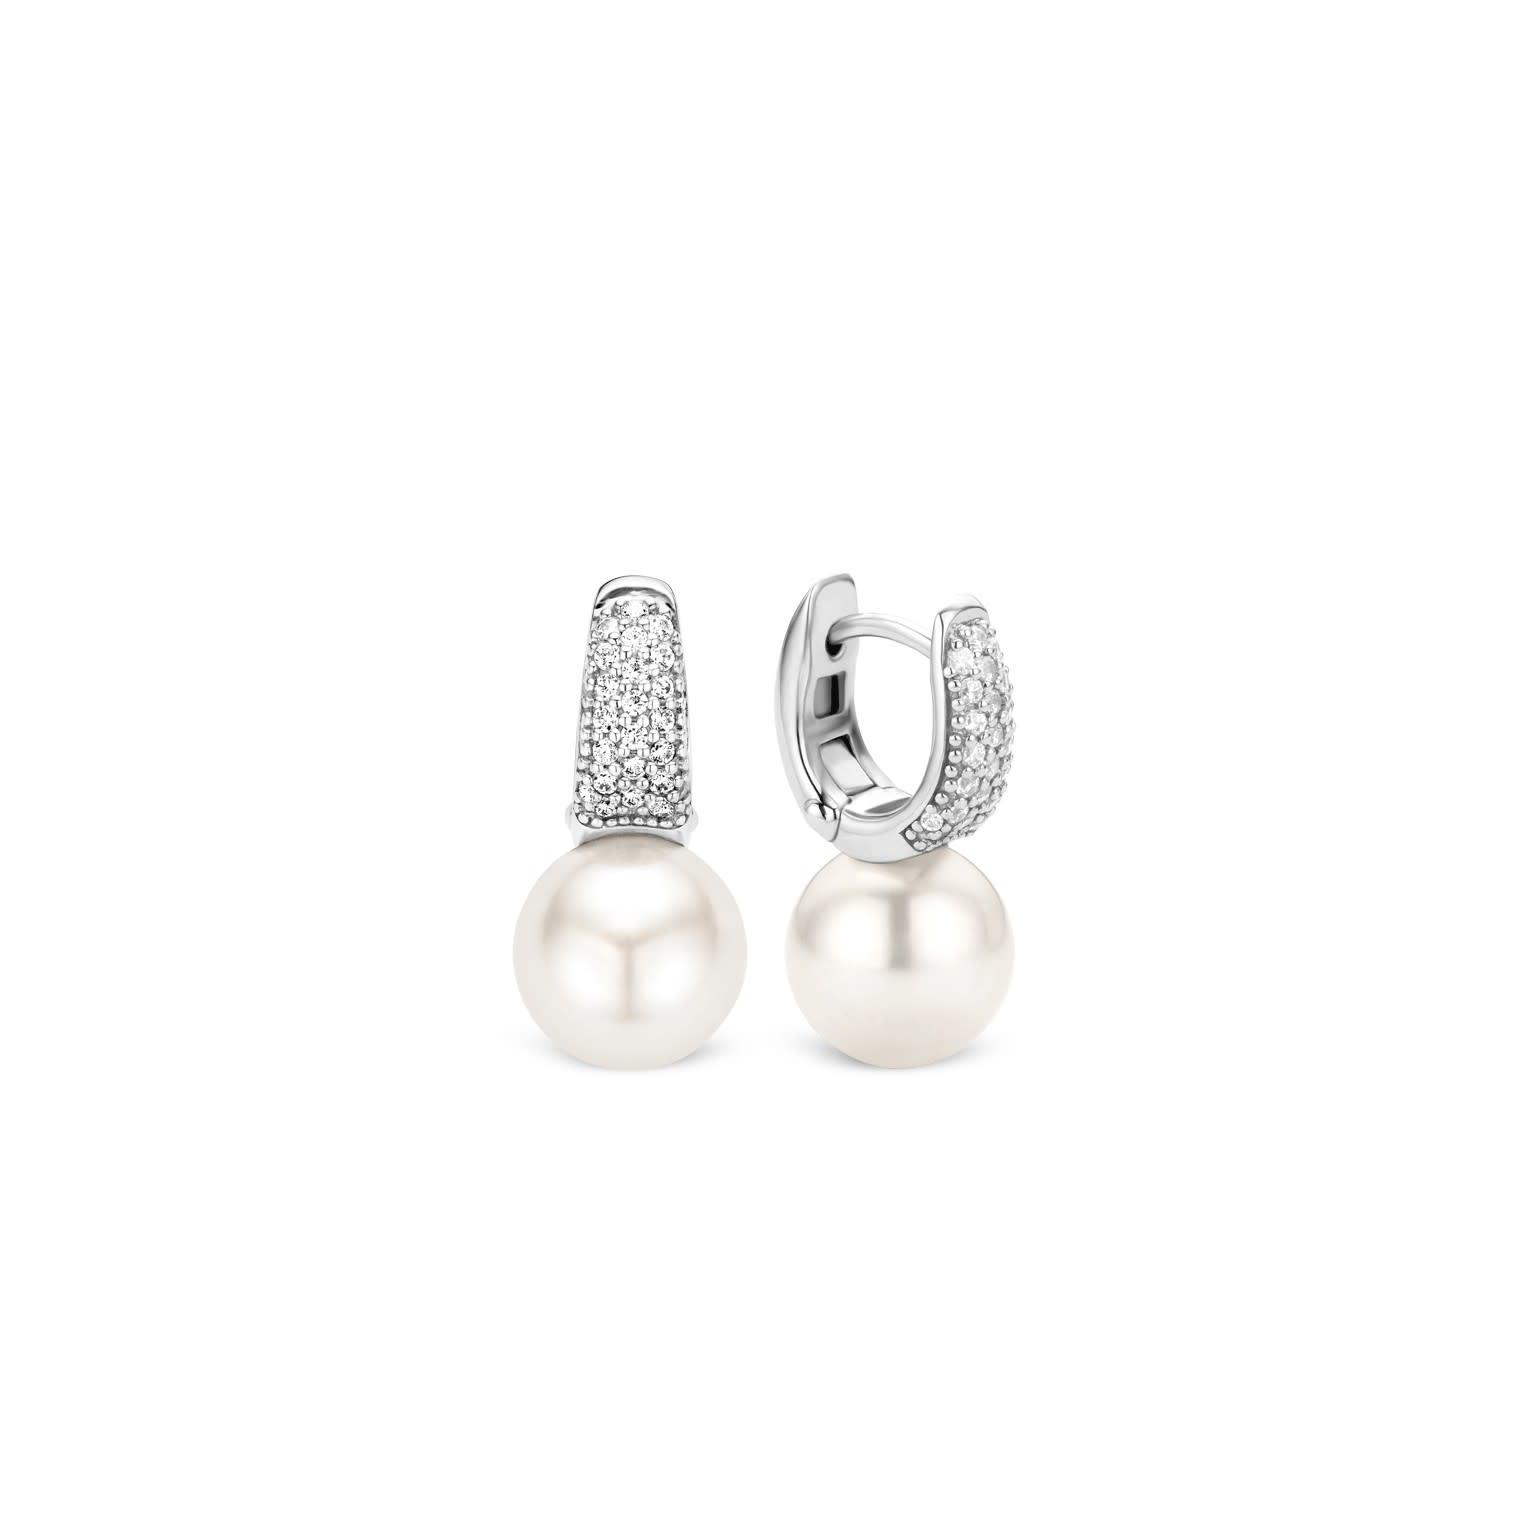 TI SENTO - Milano Earrings 7750PW-1